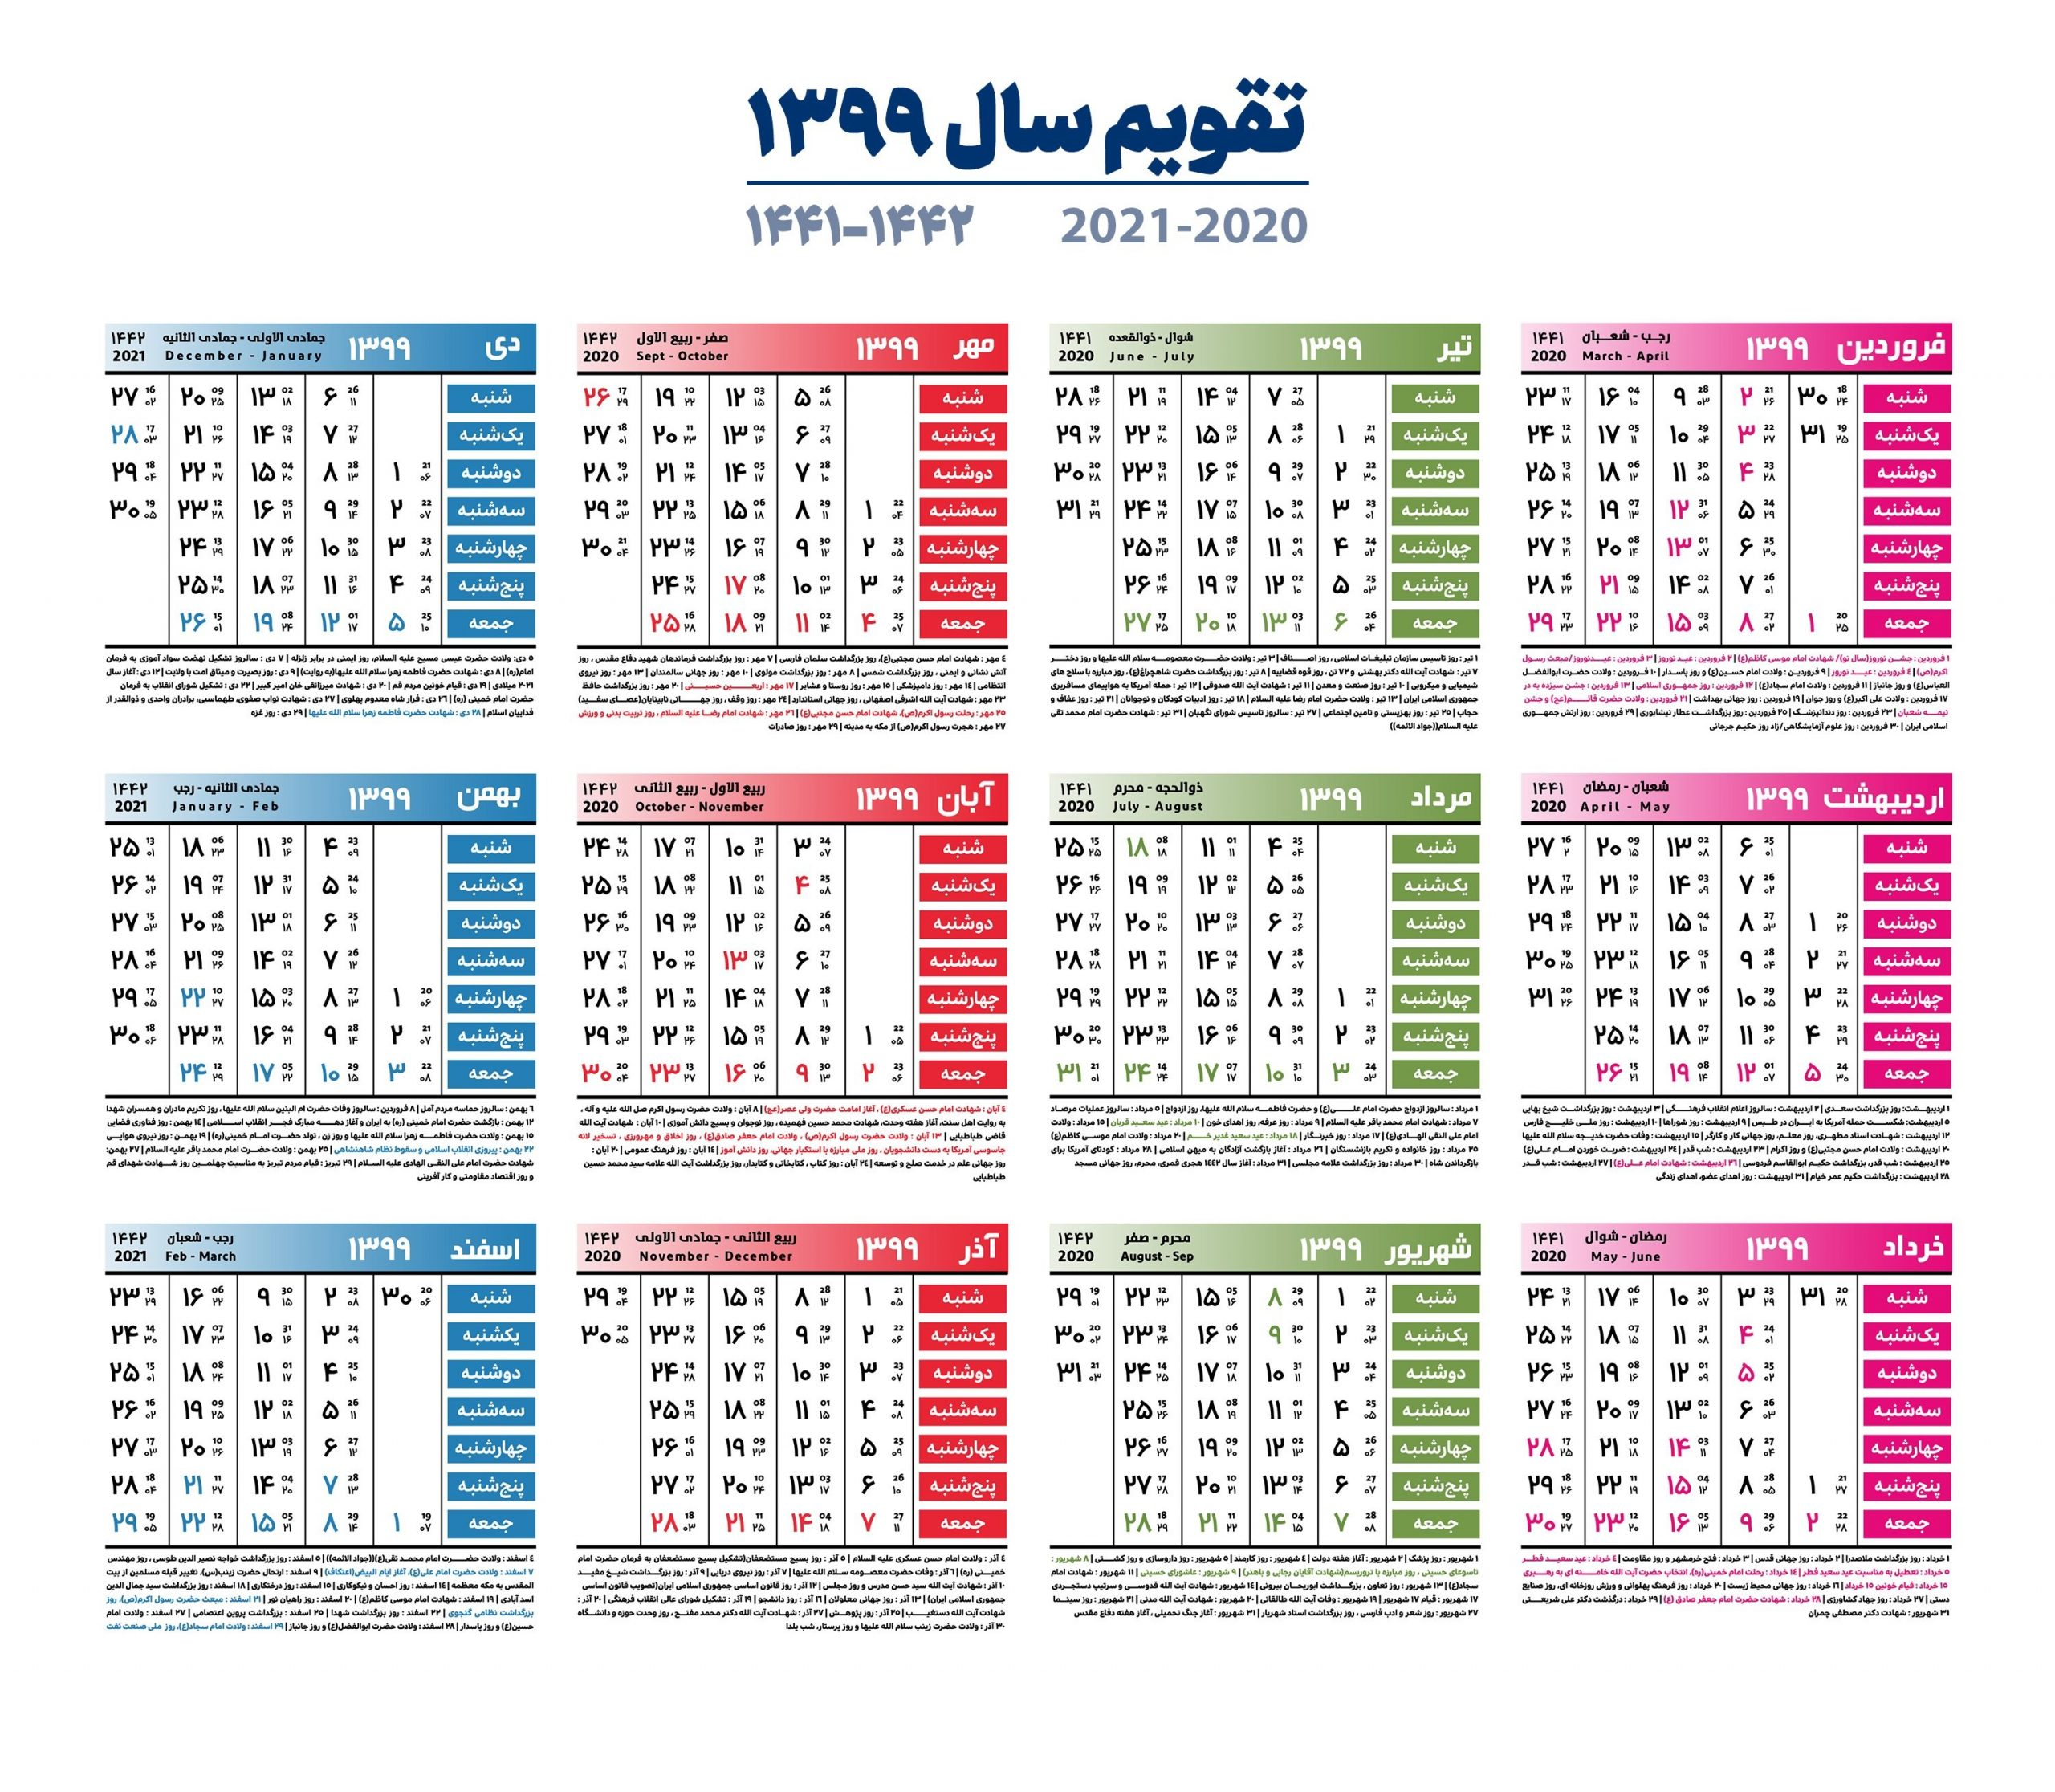 Convert Julian Date 2 025 To Calendar Date | Printable Calendar 2020 2021 Intended For Julian Date Conversion 2022